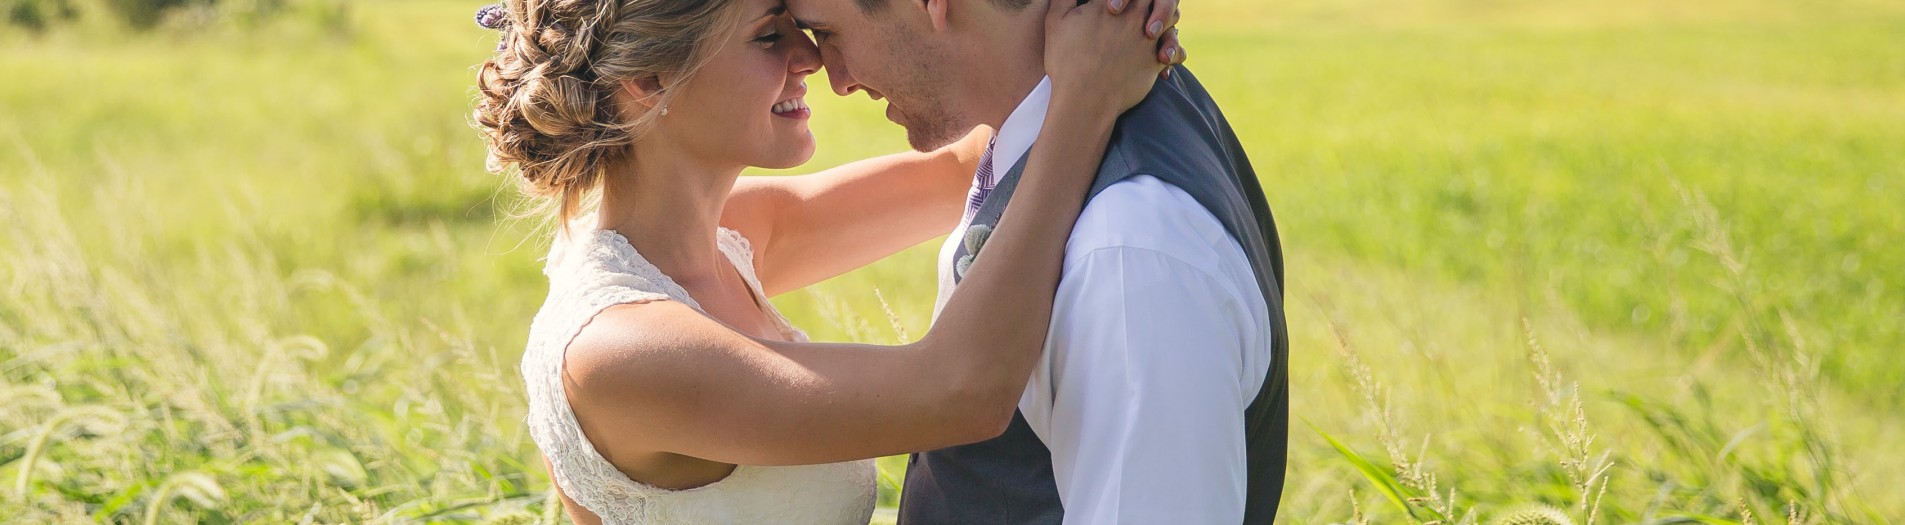 Alisa + Ryan | Outdoor Wedding at Starlight Meadows